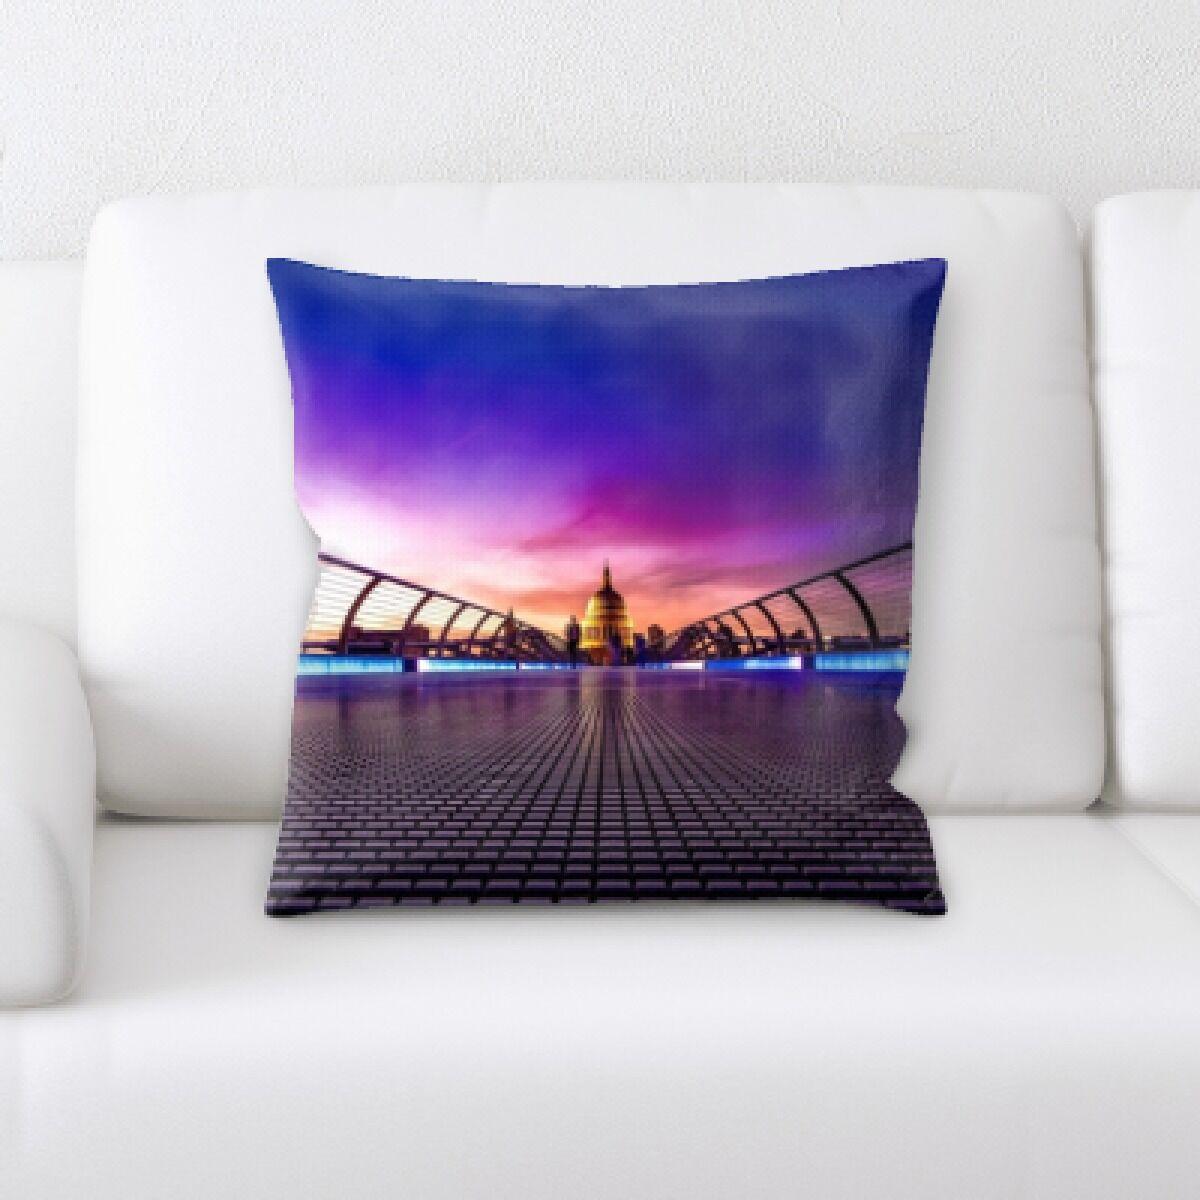 Guida City of London Throw Pillow